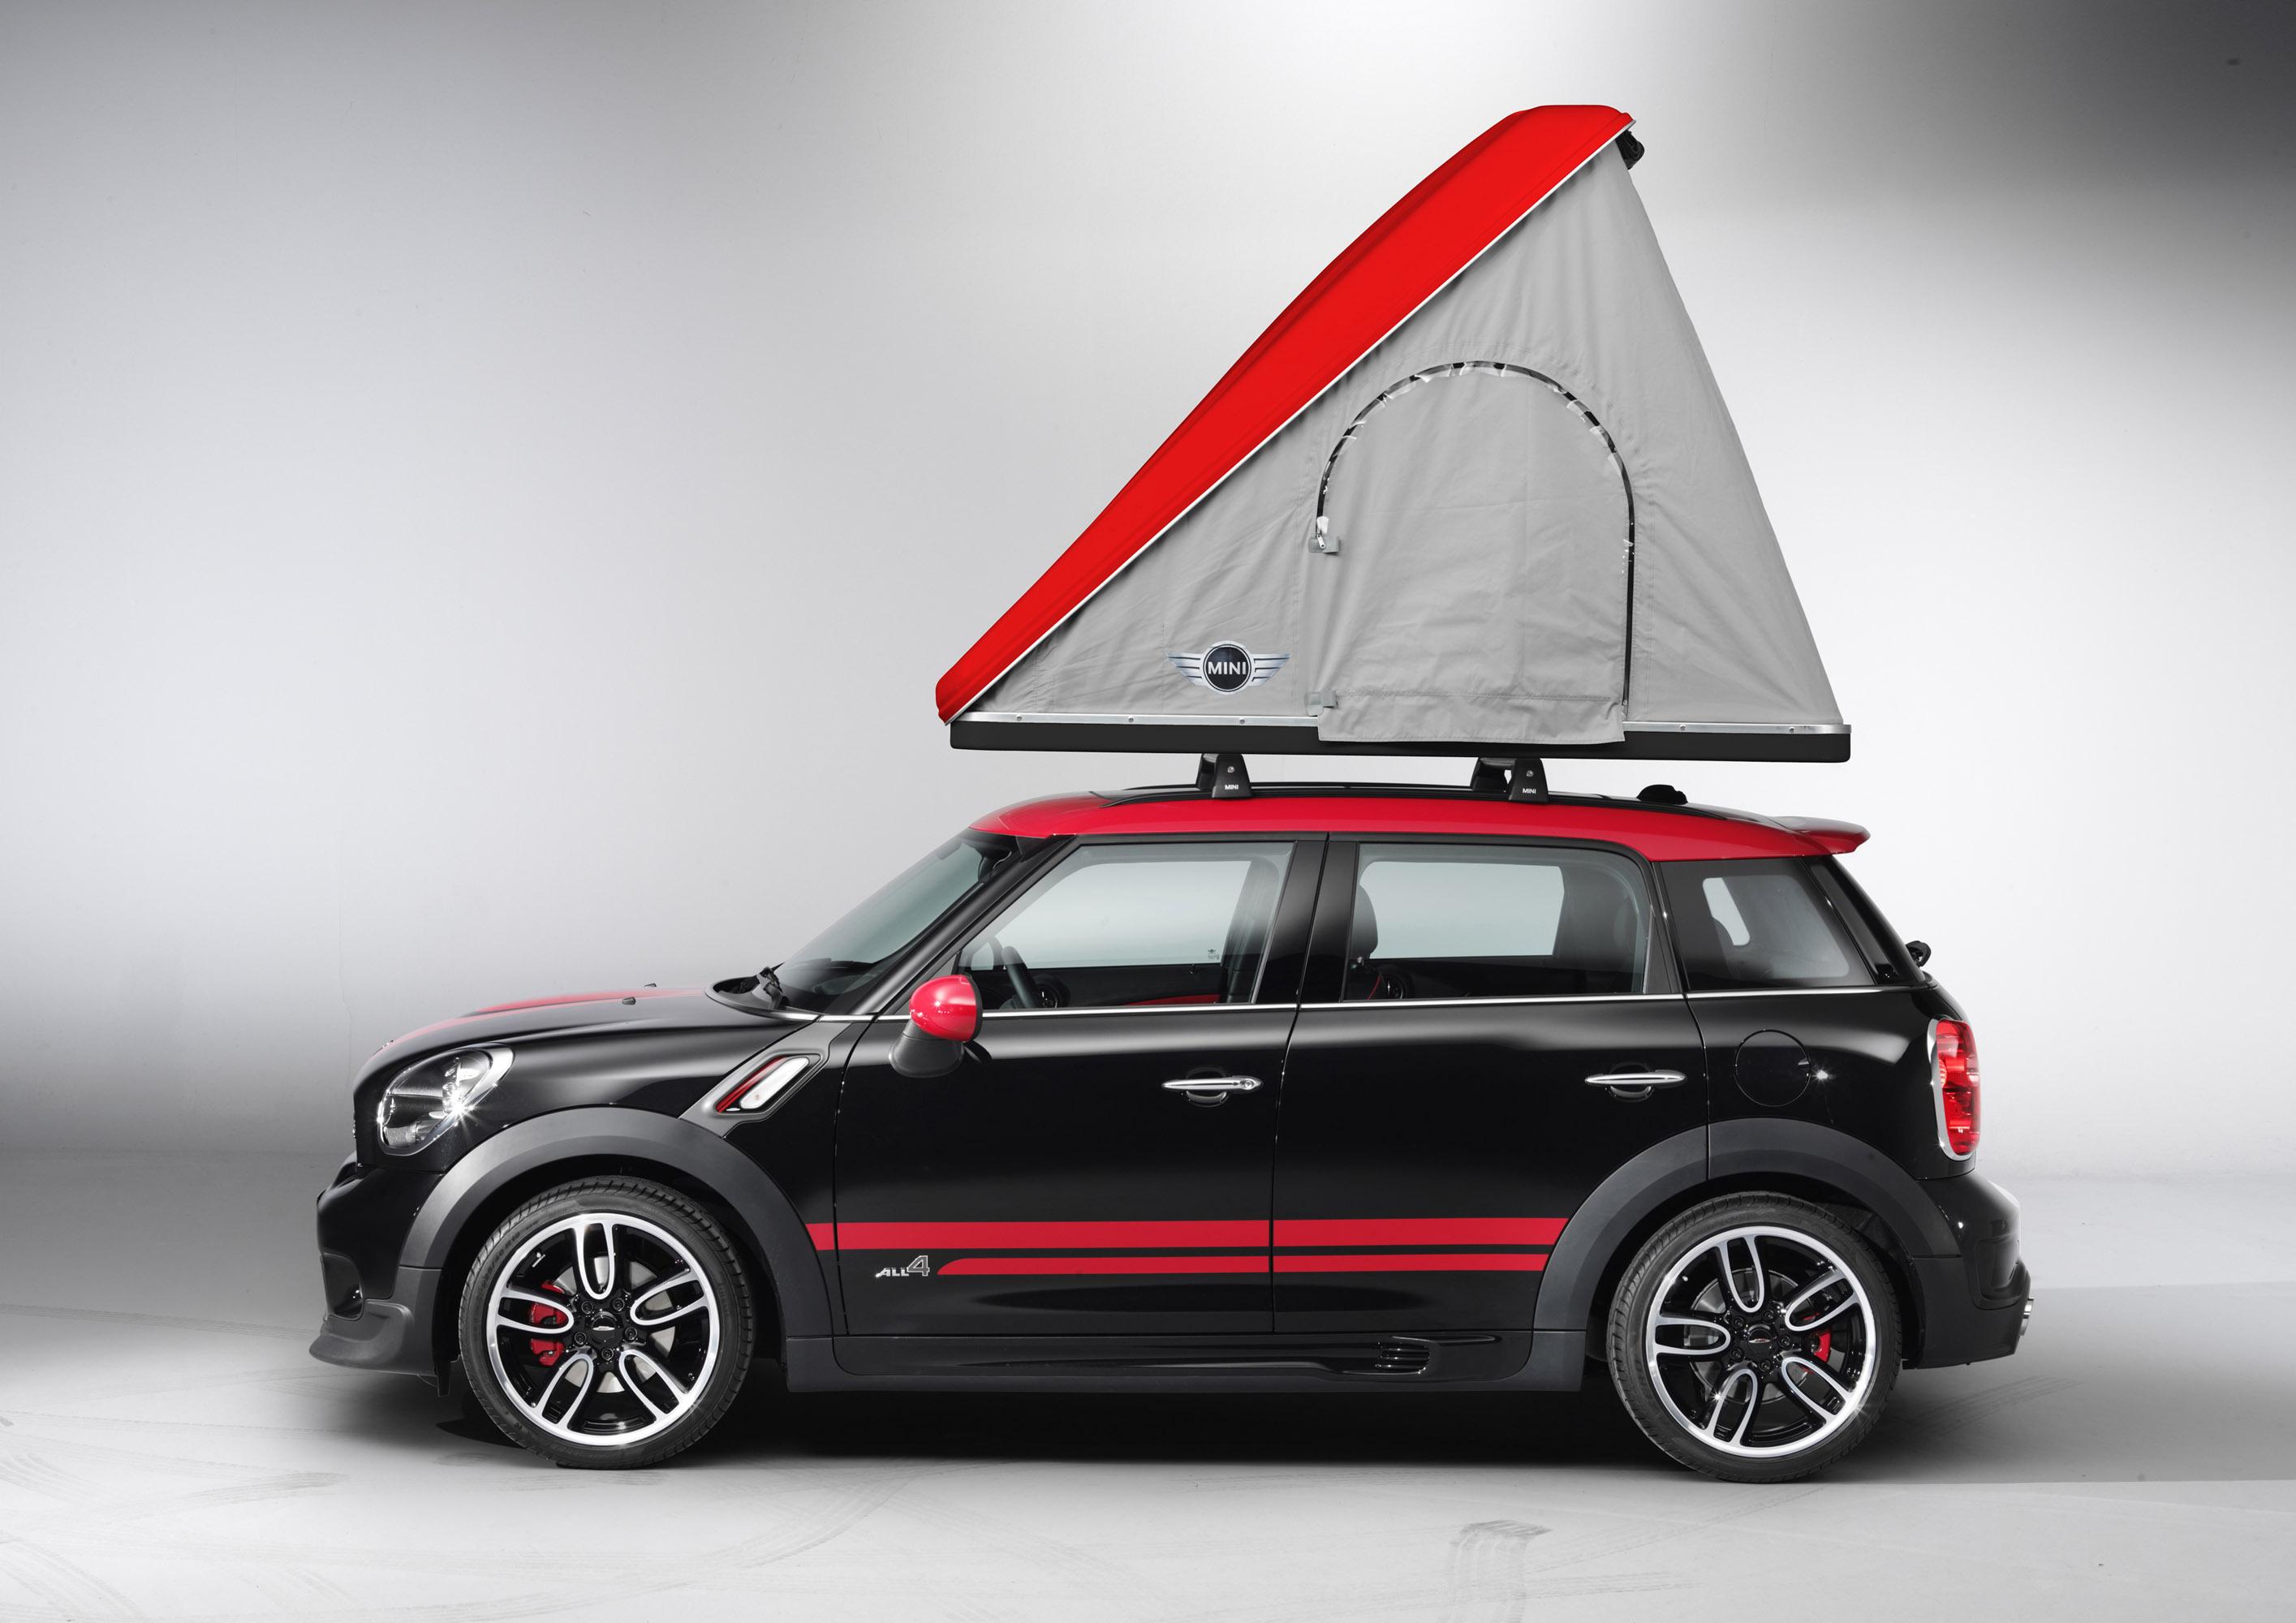 ... MINI Swindon Roof Top Tent  4 of 9 ... & MINI goes camping with MINI Cowley Caravan and MINI Swindon Roof ...